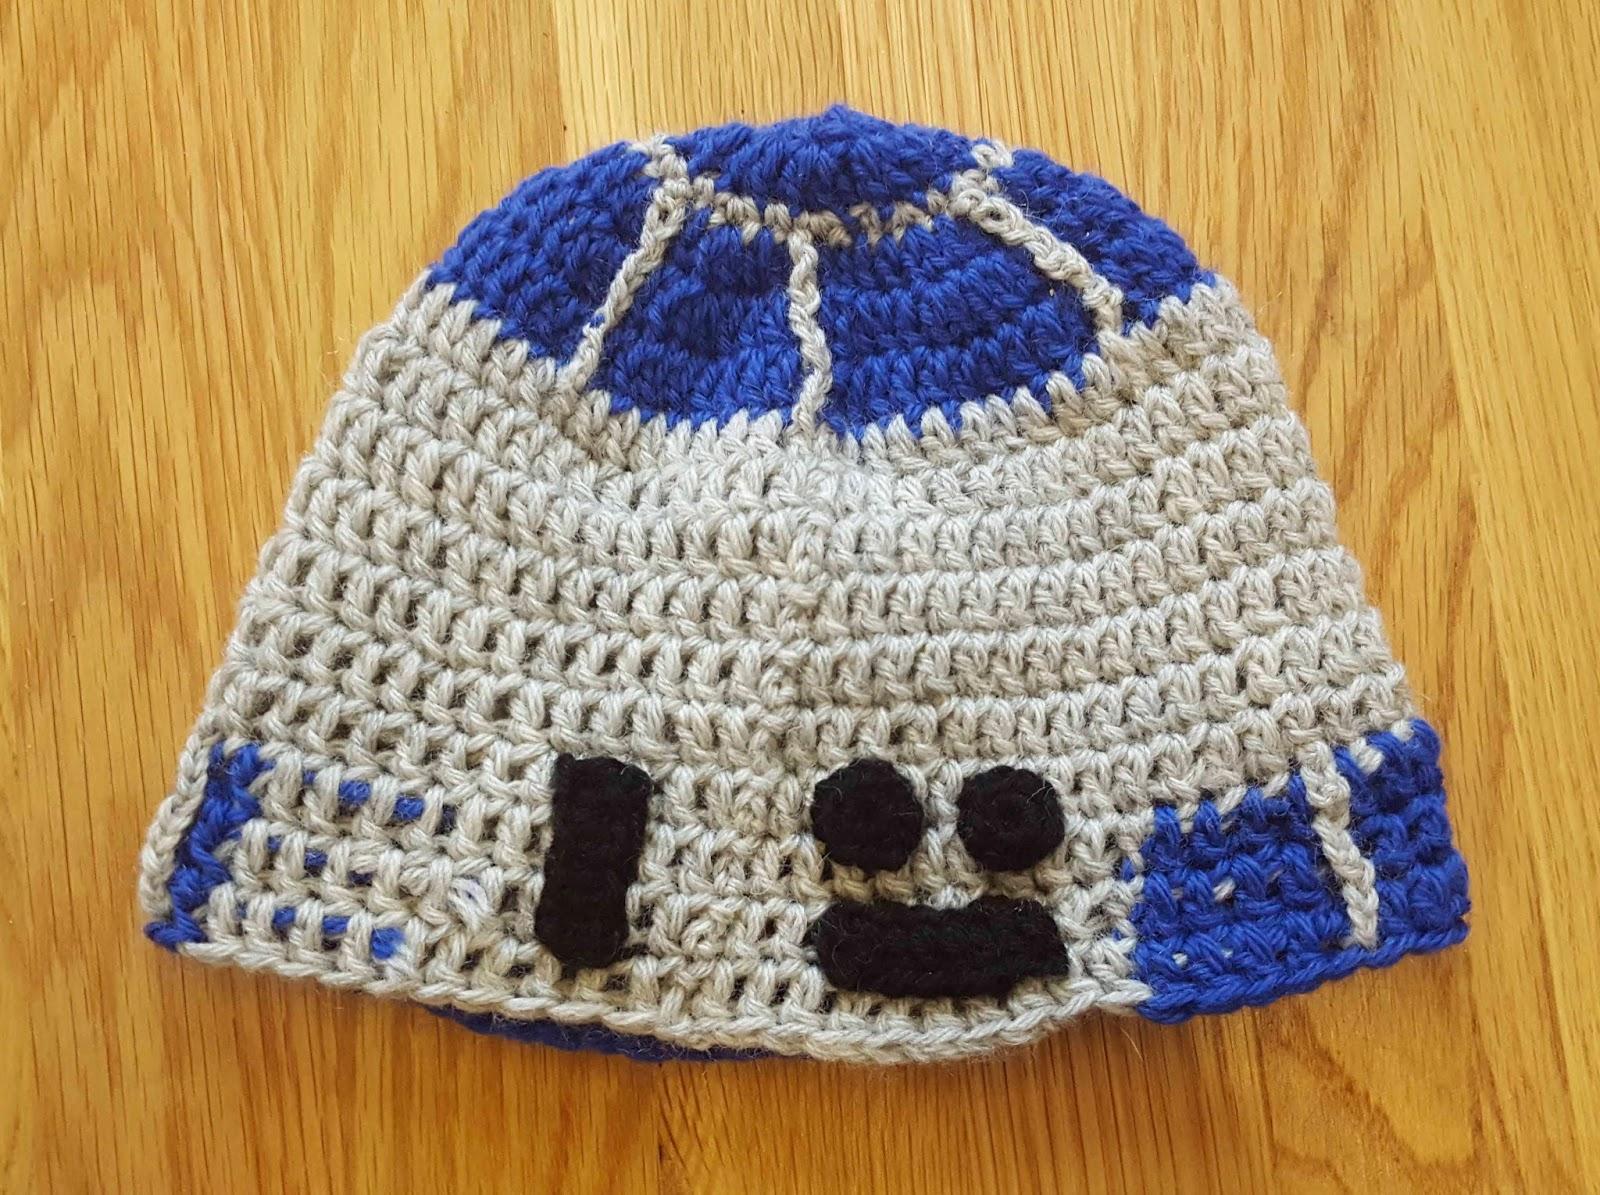 ChemKnits: A Crochet R2-D2 Hat